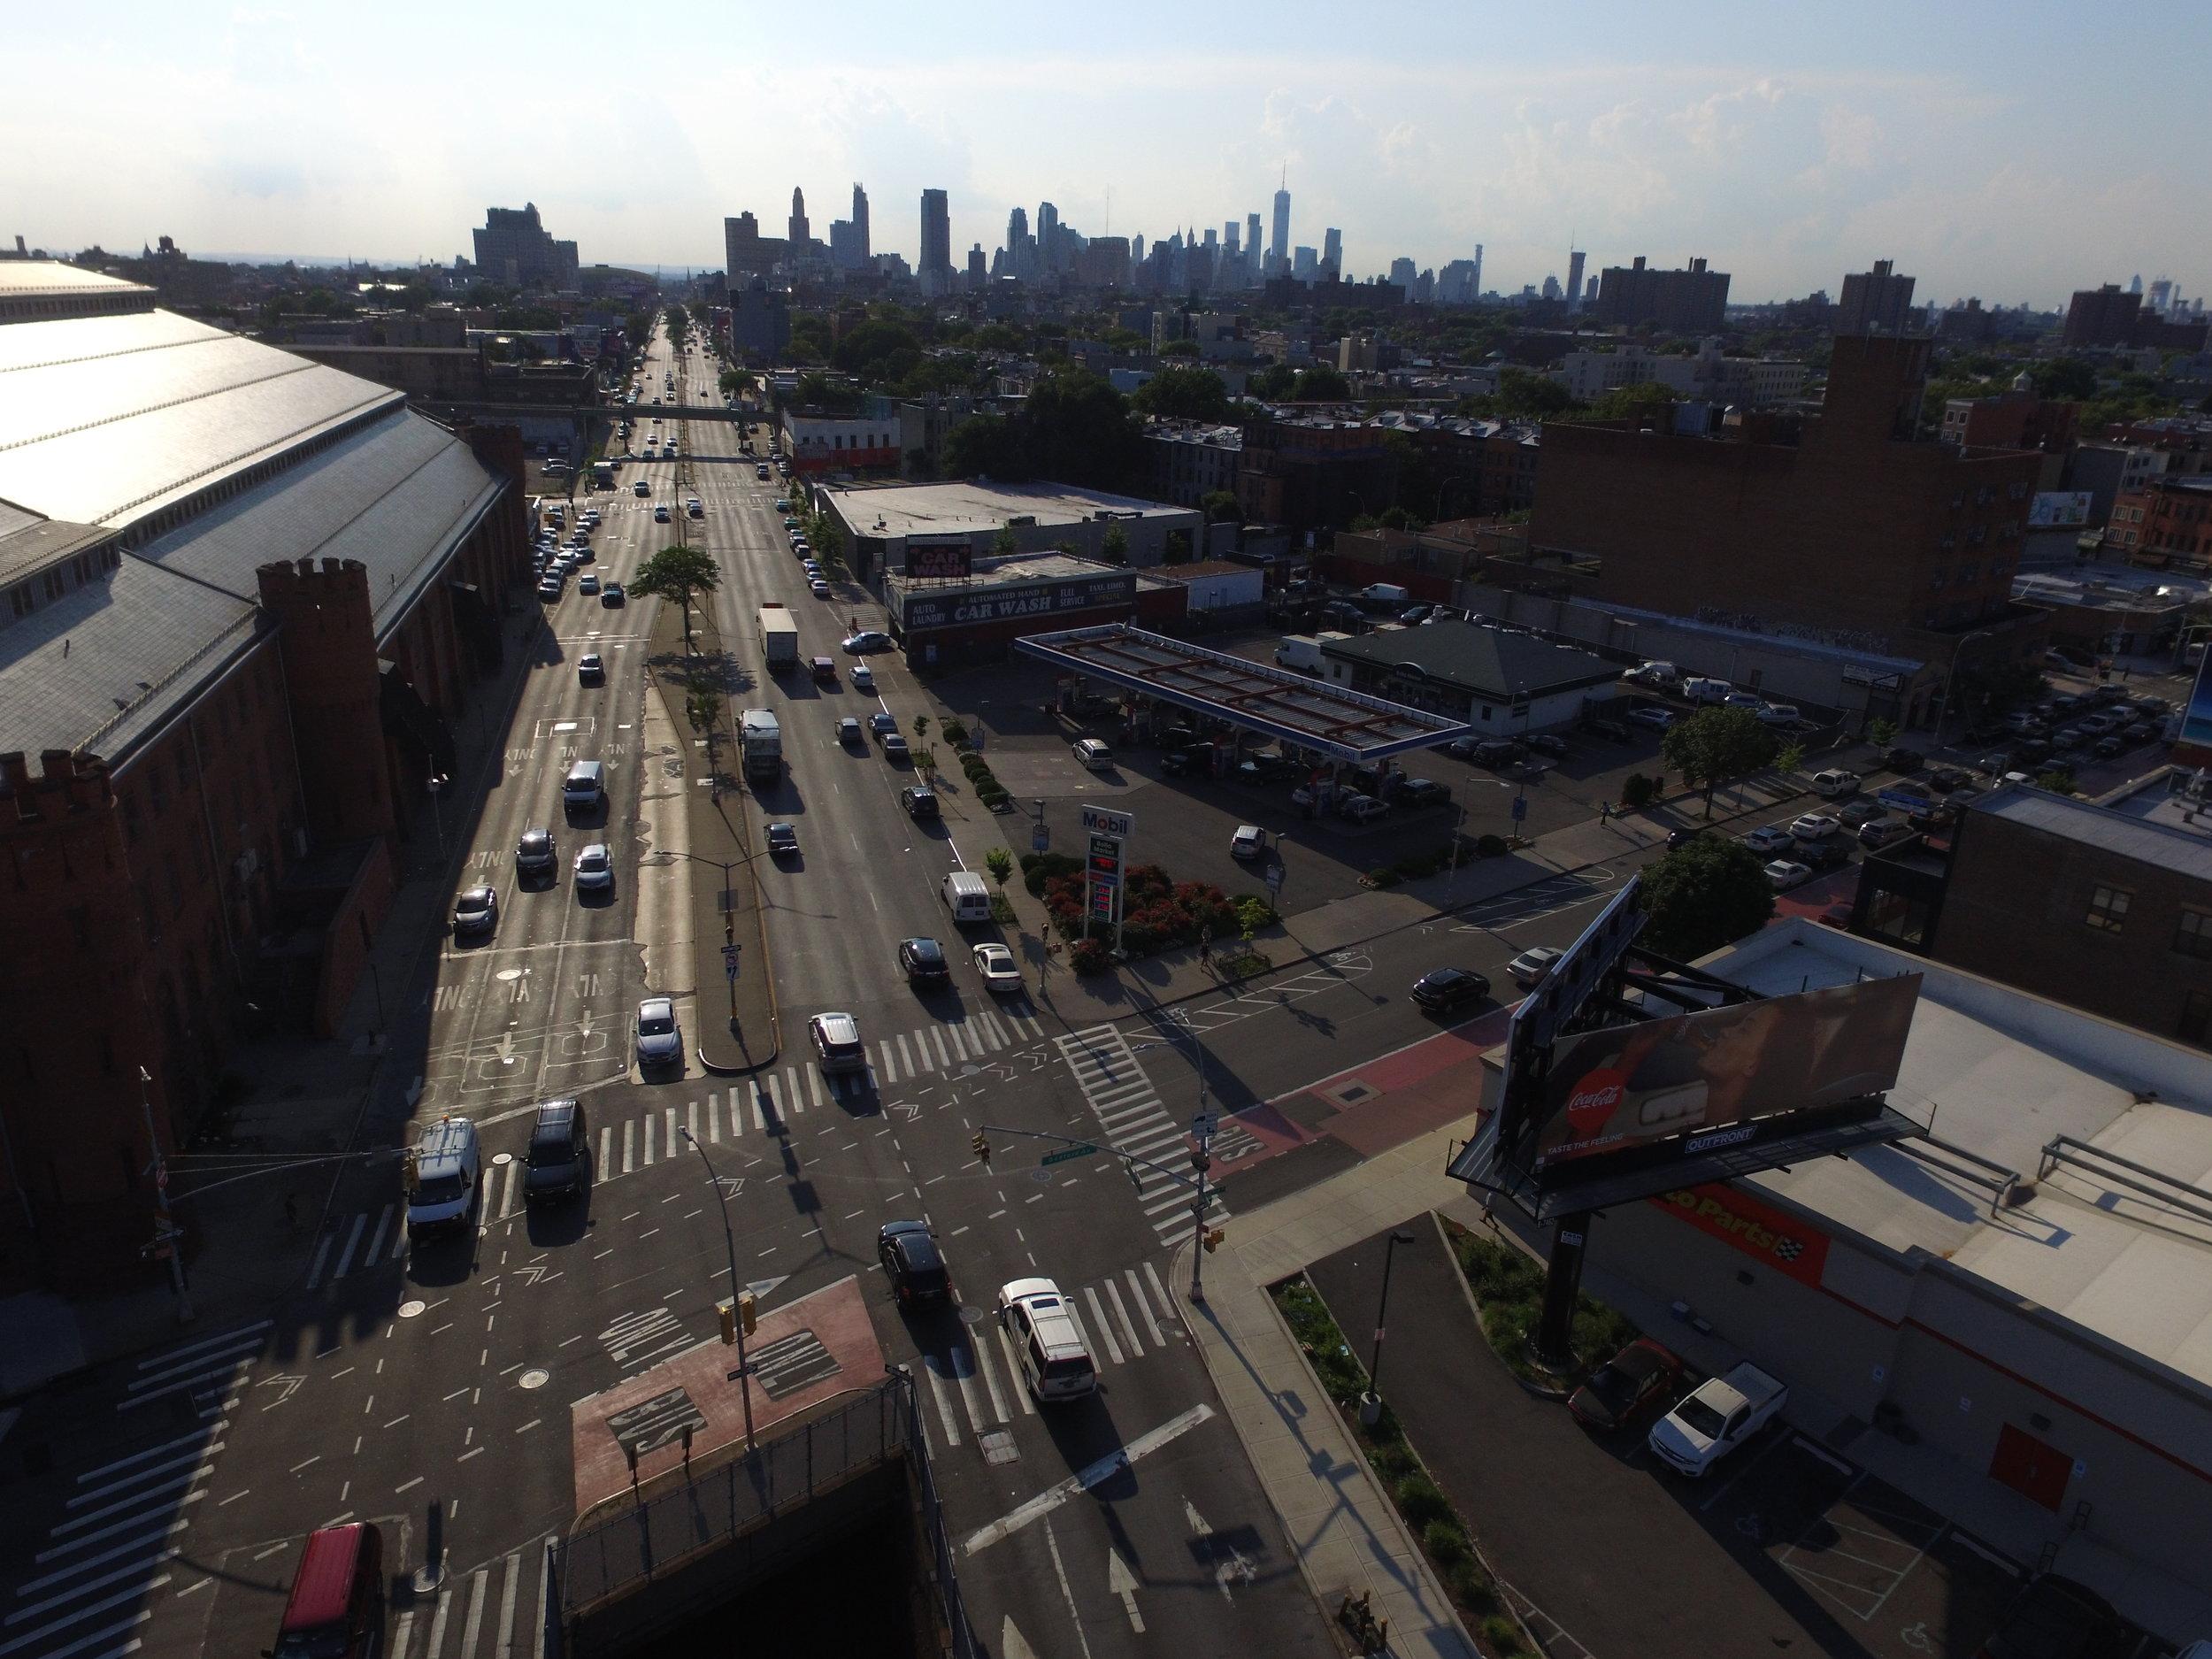 Atlantic Avenue at Bedford Avenue looking west.Photo: Darryl Montgomery, 2017.